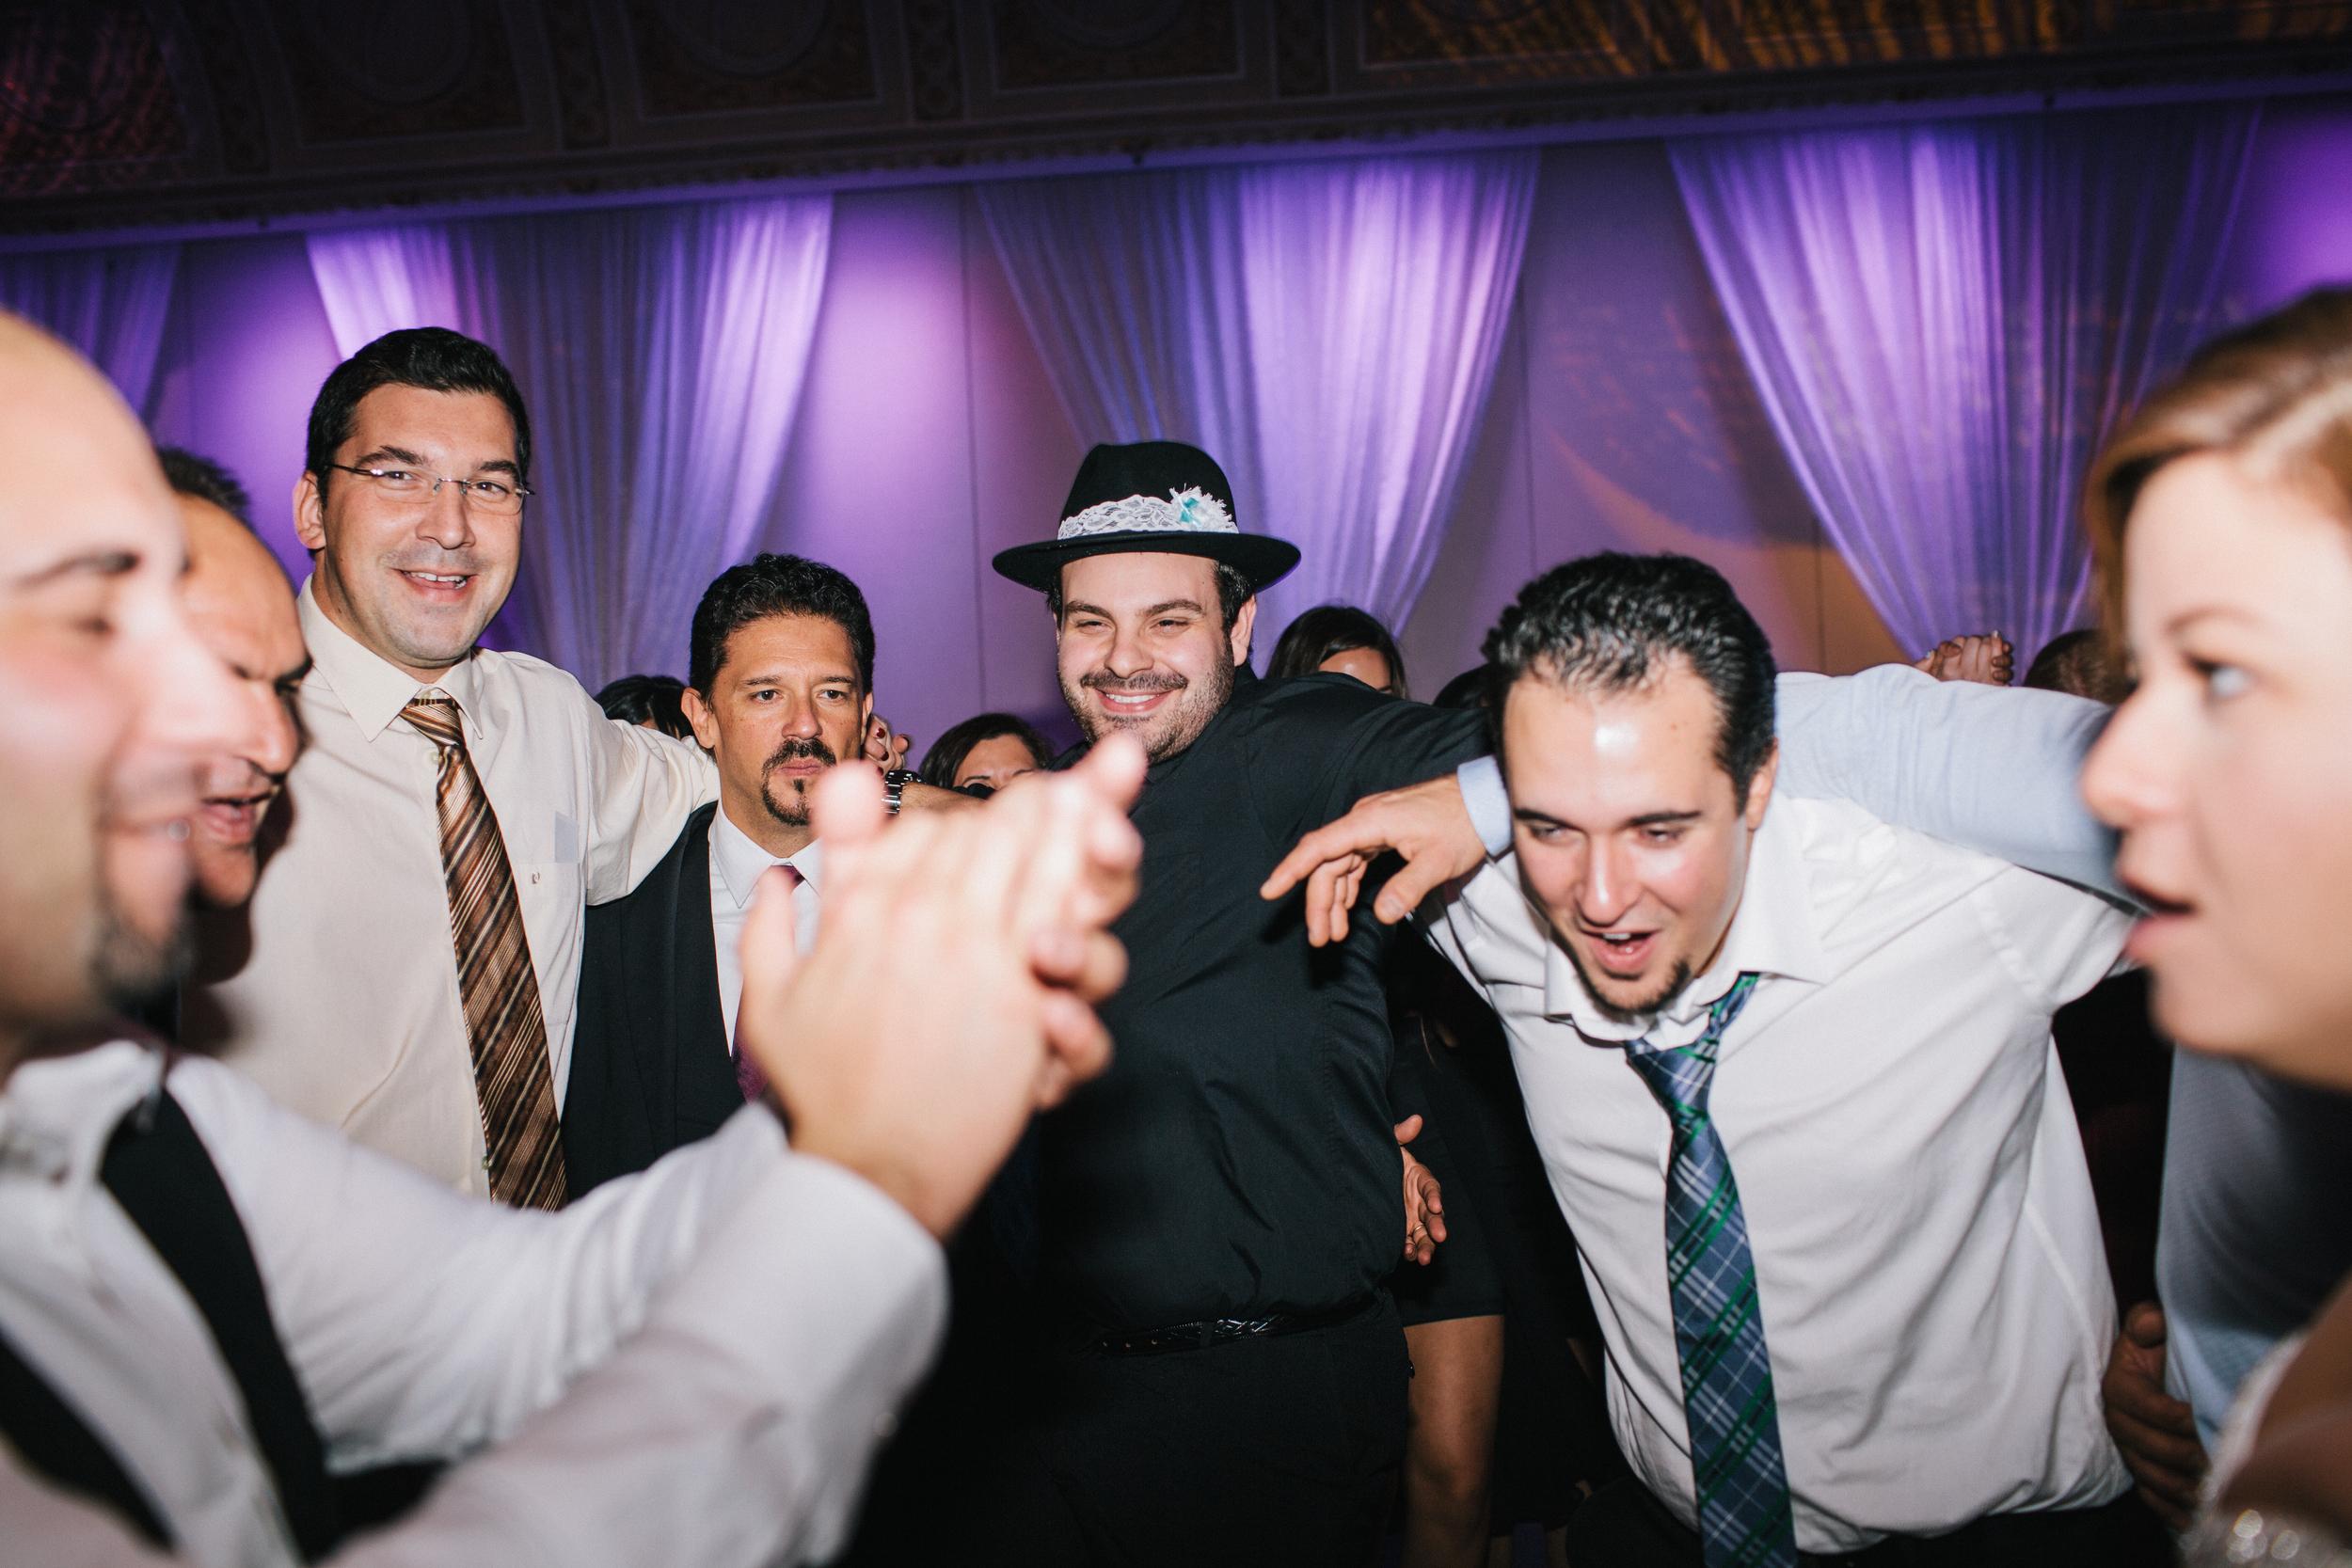 Stephanie-Kyle-paradise-banquet-hall-michael-rousseau-photography-best-toronto-wedding-photographer-documentary-wedding058.JPG